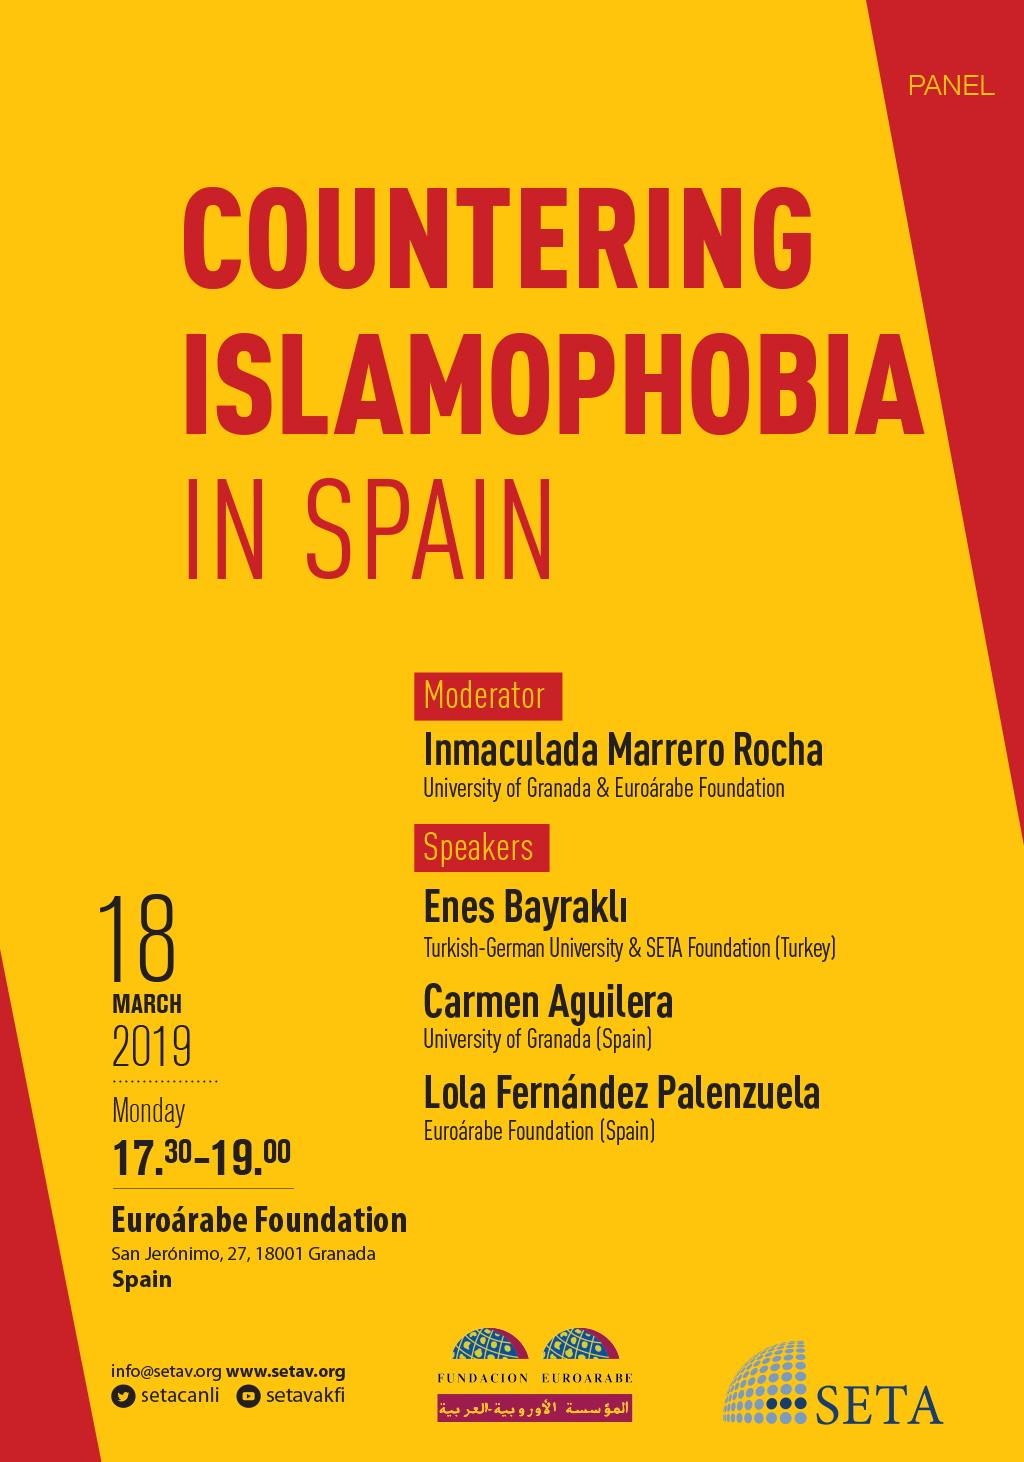 Panel: Countering Islamophobia in Spain